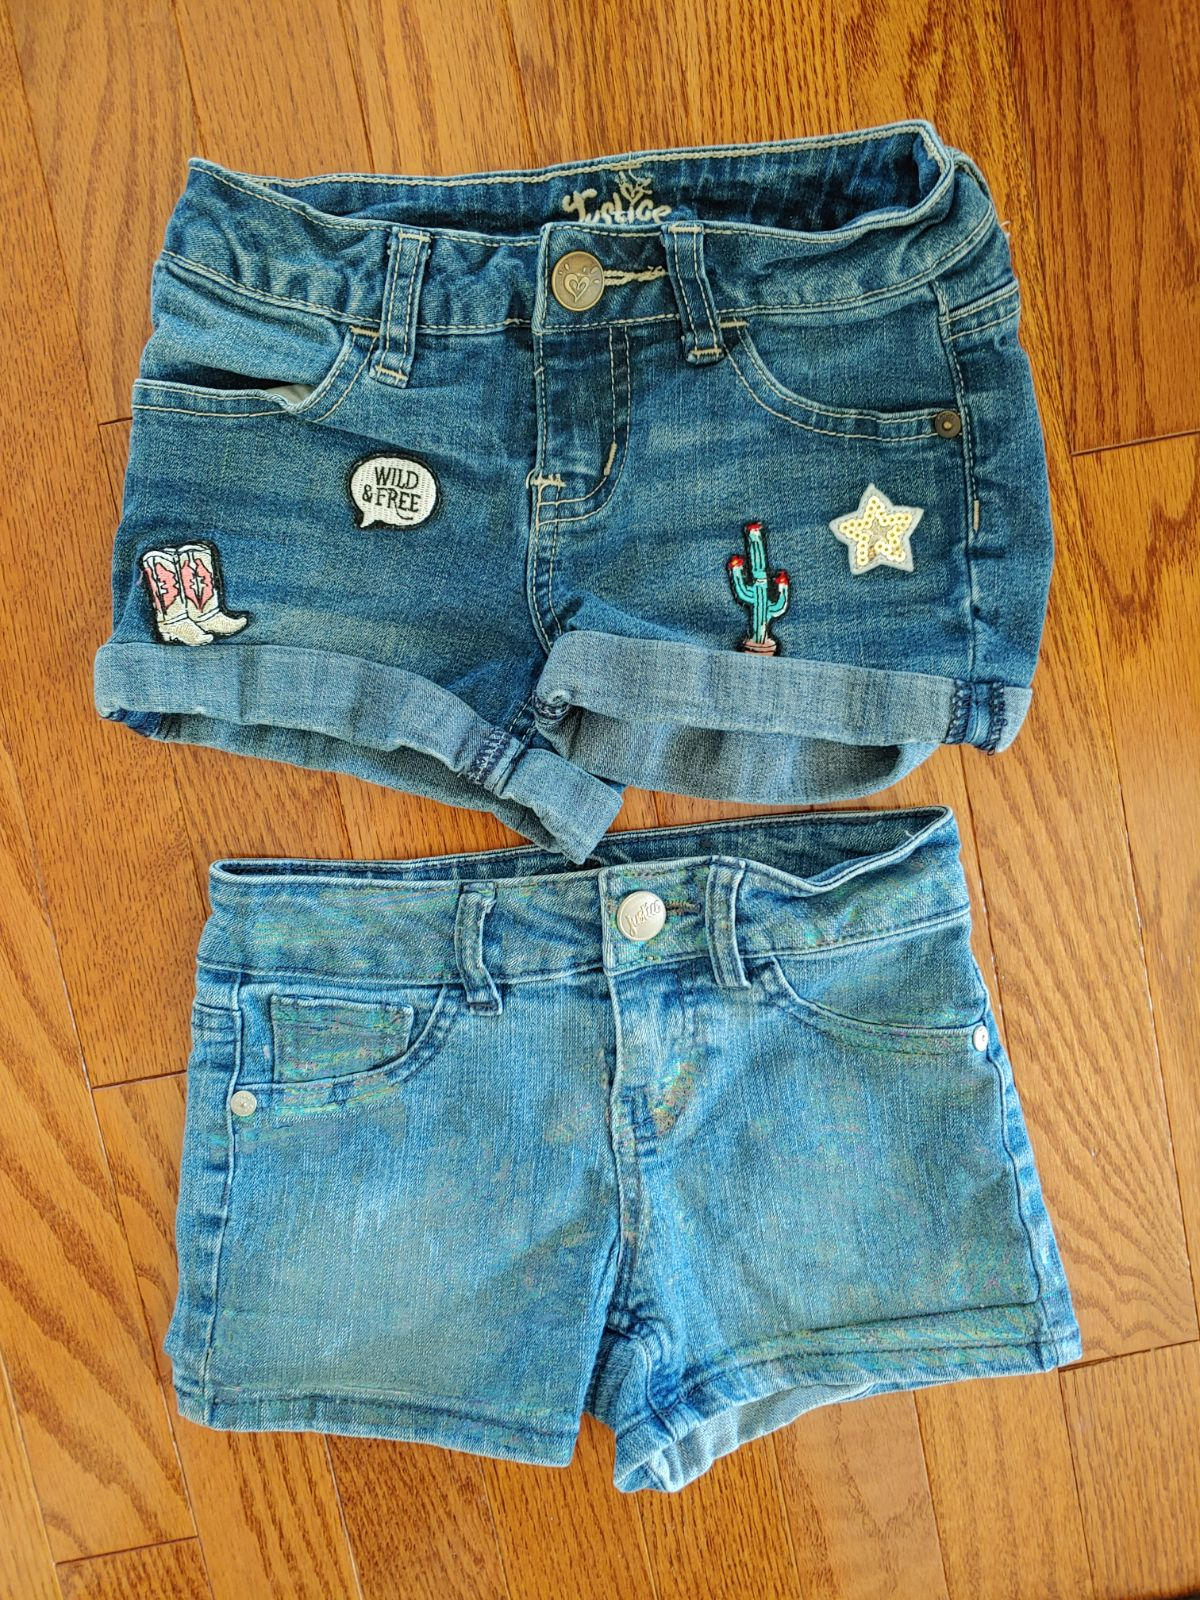 Justice shorts- 2 pairs